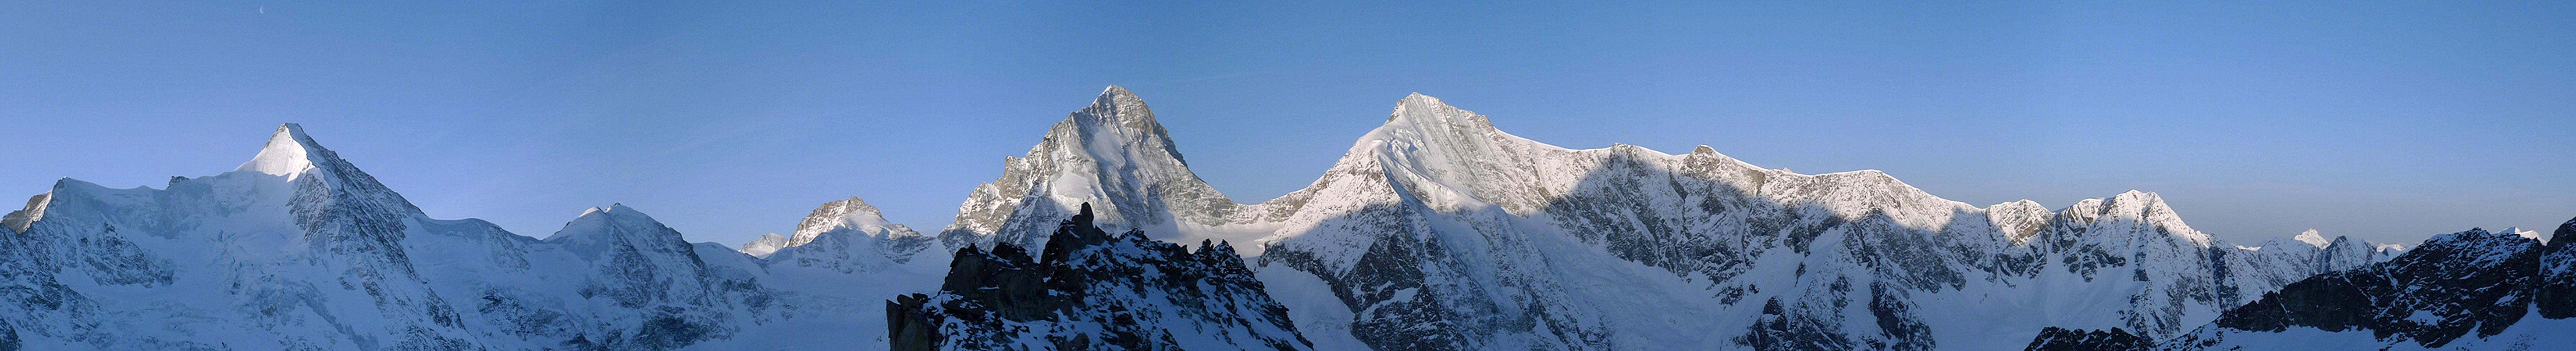 Blanc de Moming - Dôme Circuit Walliser Alpen / Alpes valaisannes Switzerland panorama 18